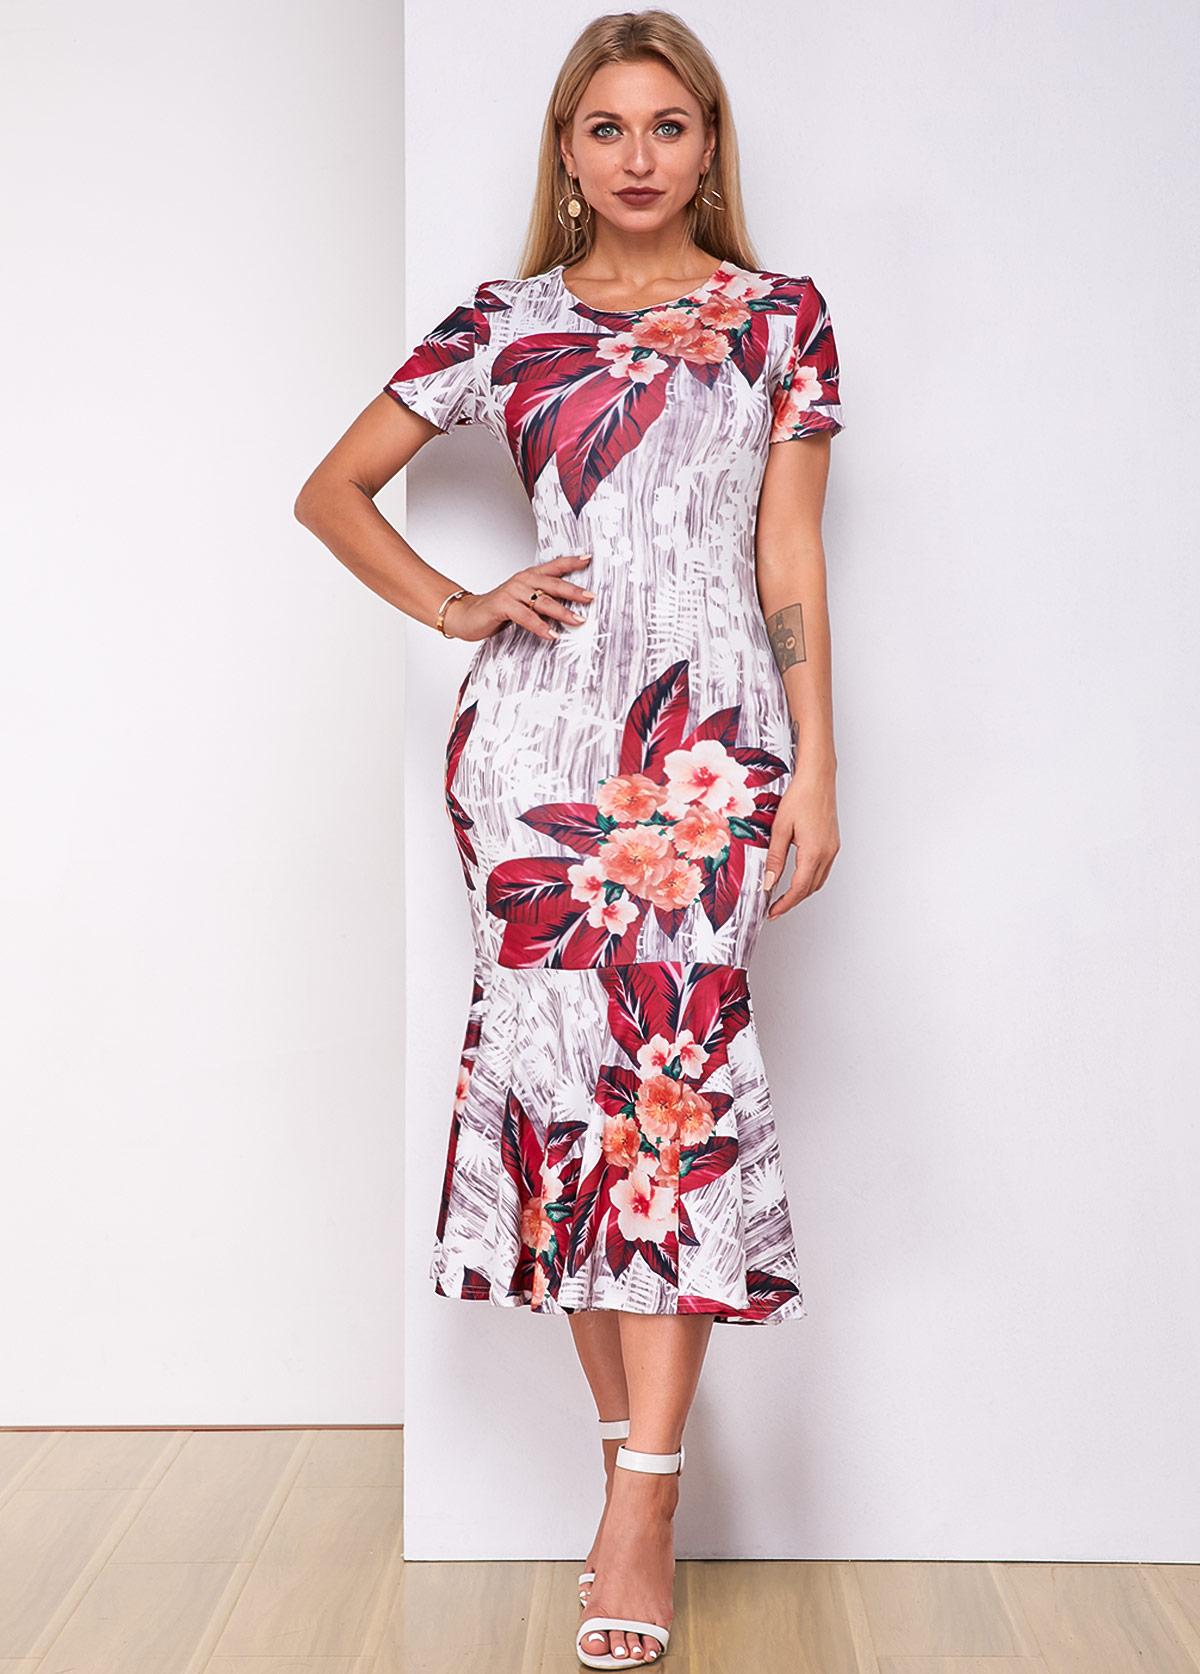 Floral Print Round Neck Short Sleeve Mermaid Dress